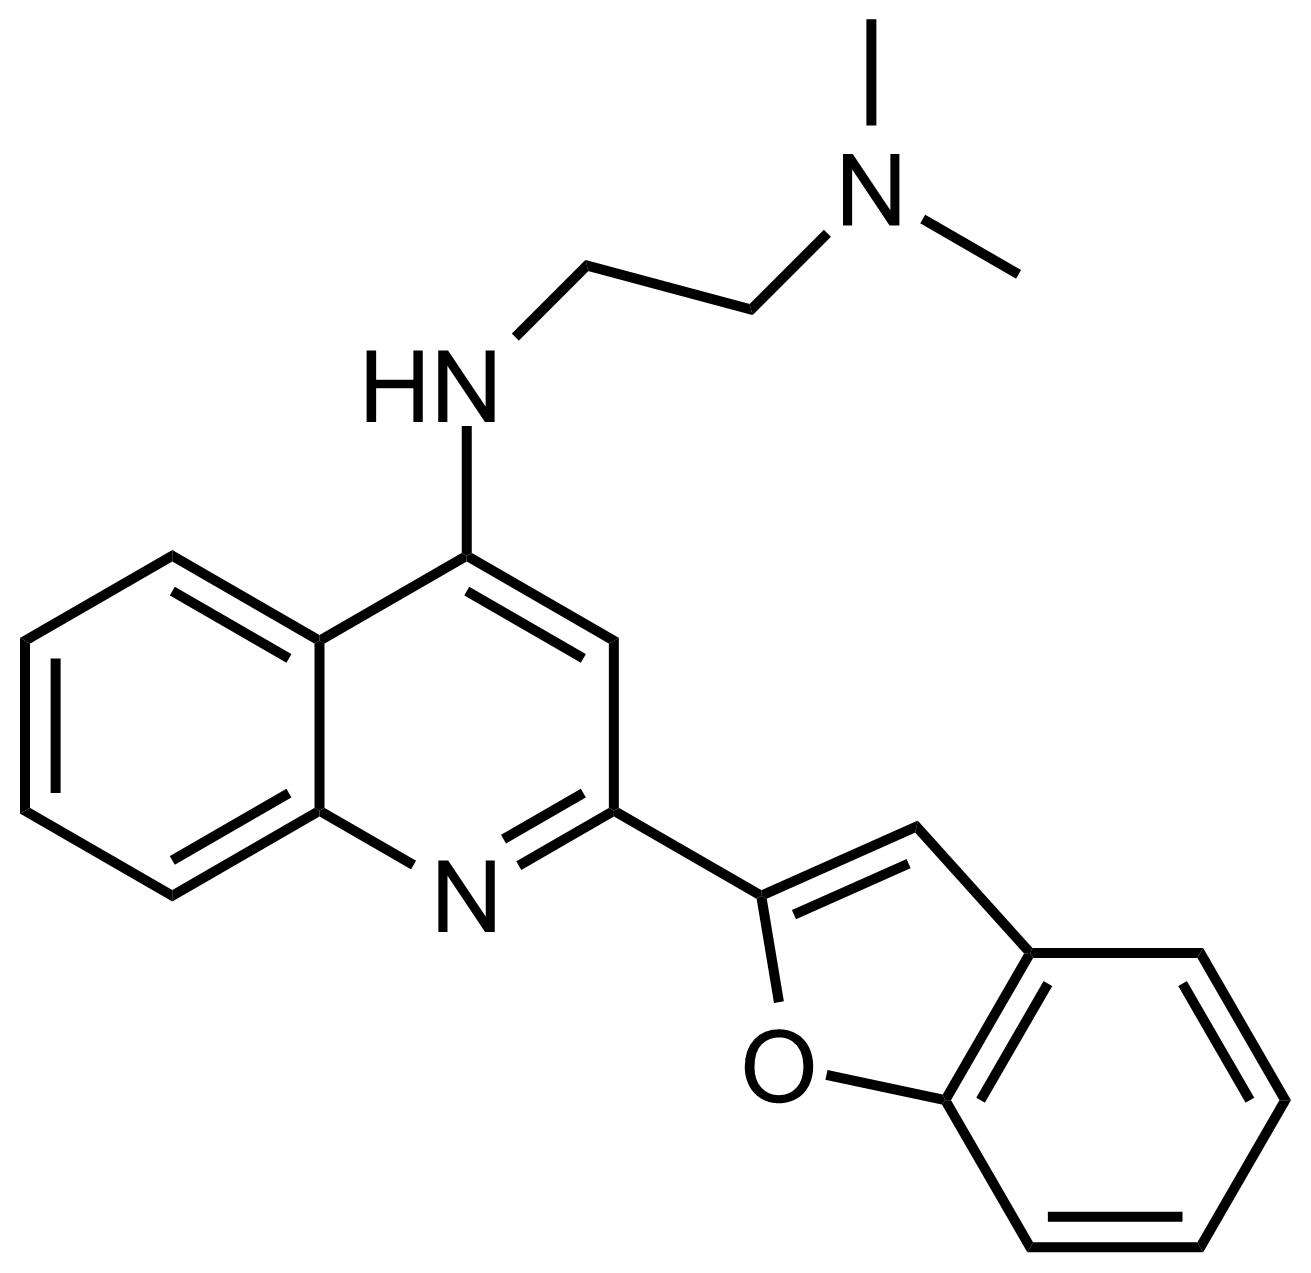 Structure of N'-(2-(Benzofuran-2-yl)quinolin-4-yl)-N,N-dimethylethane-1,2-diamine